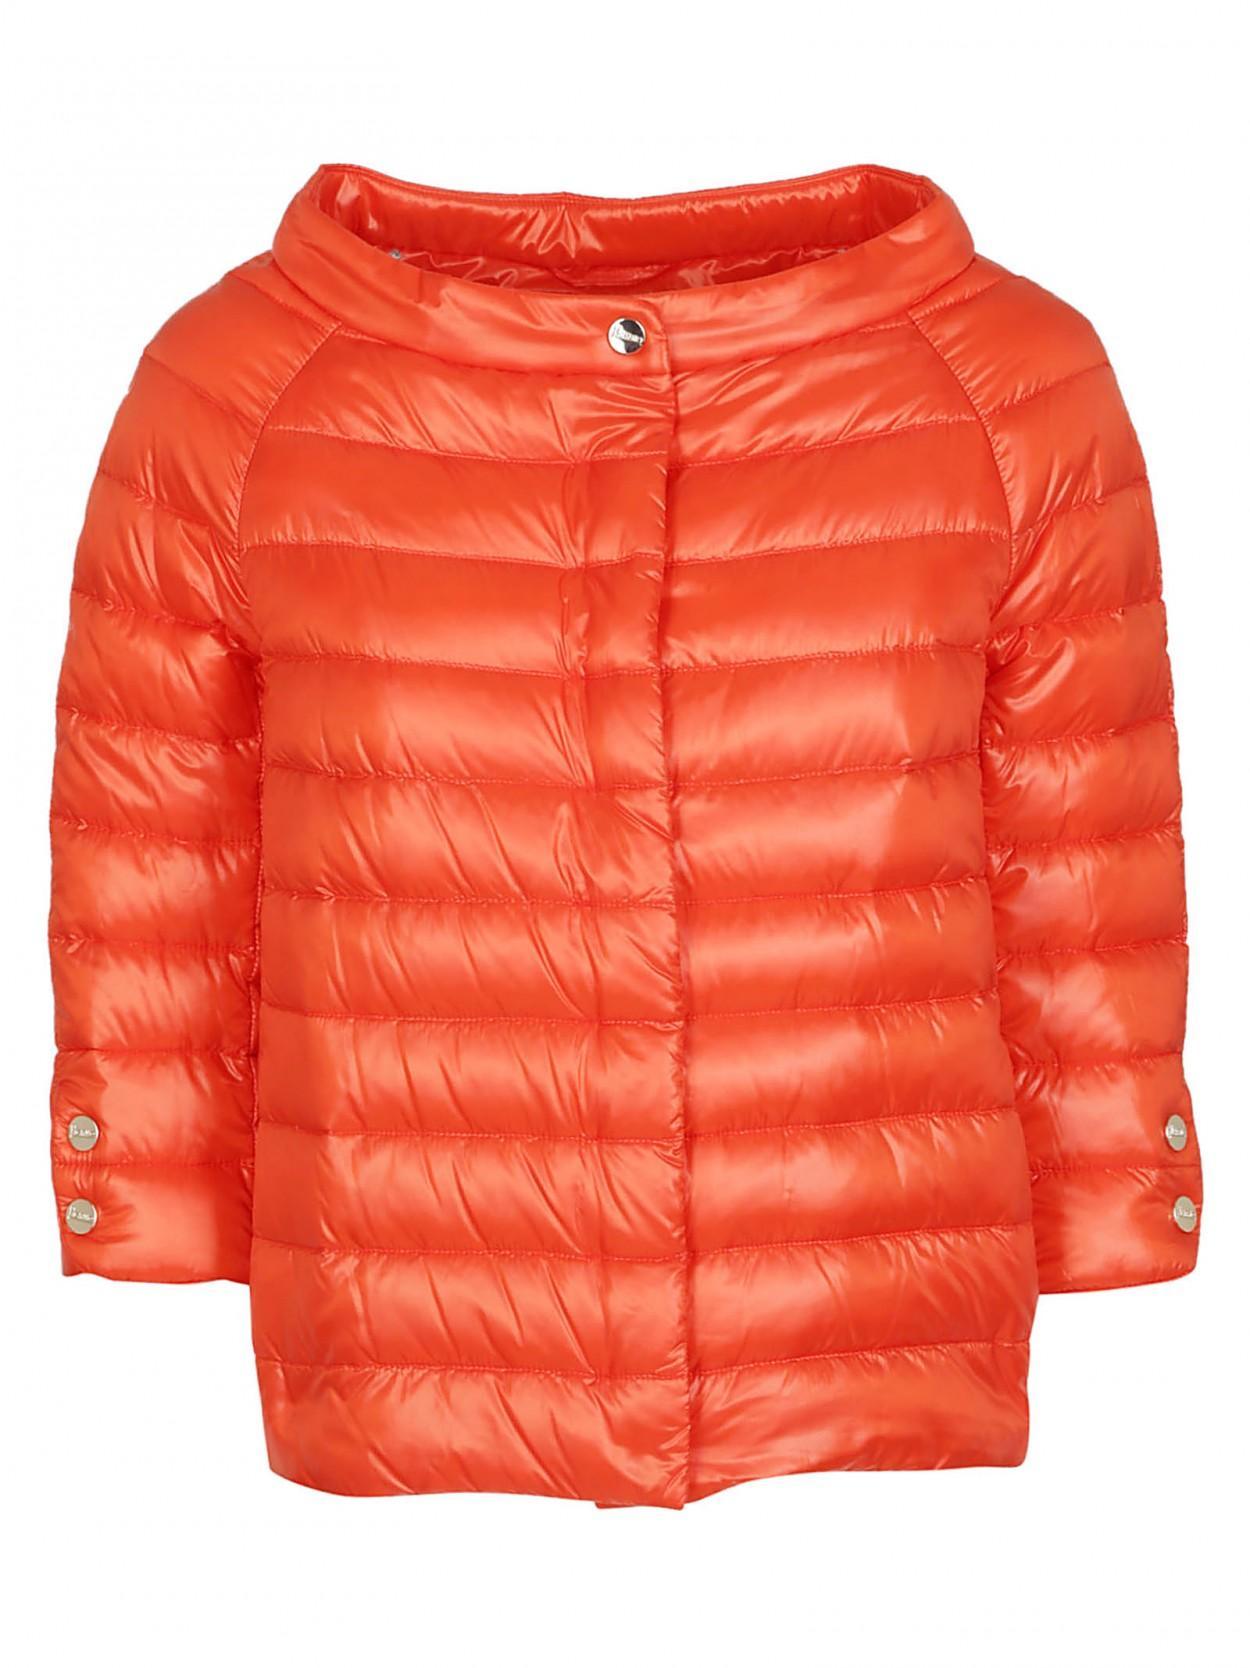 reputable site c442d db55c Women's Orange HERNO piumino light arancio 100 grammi